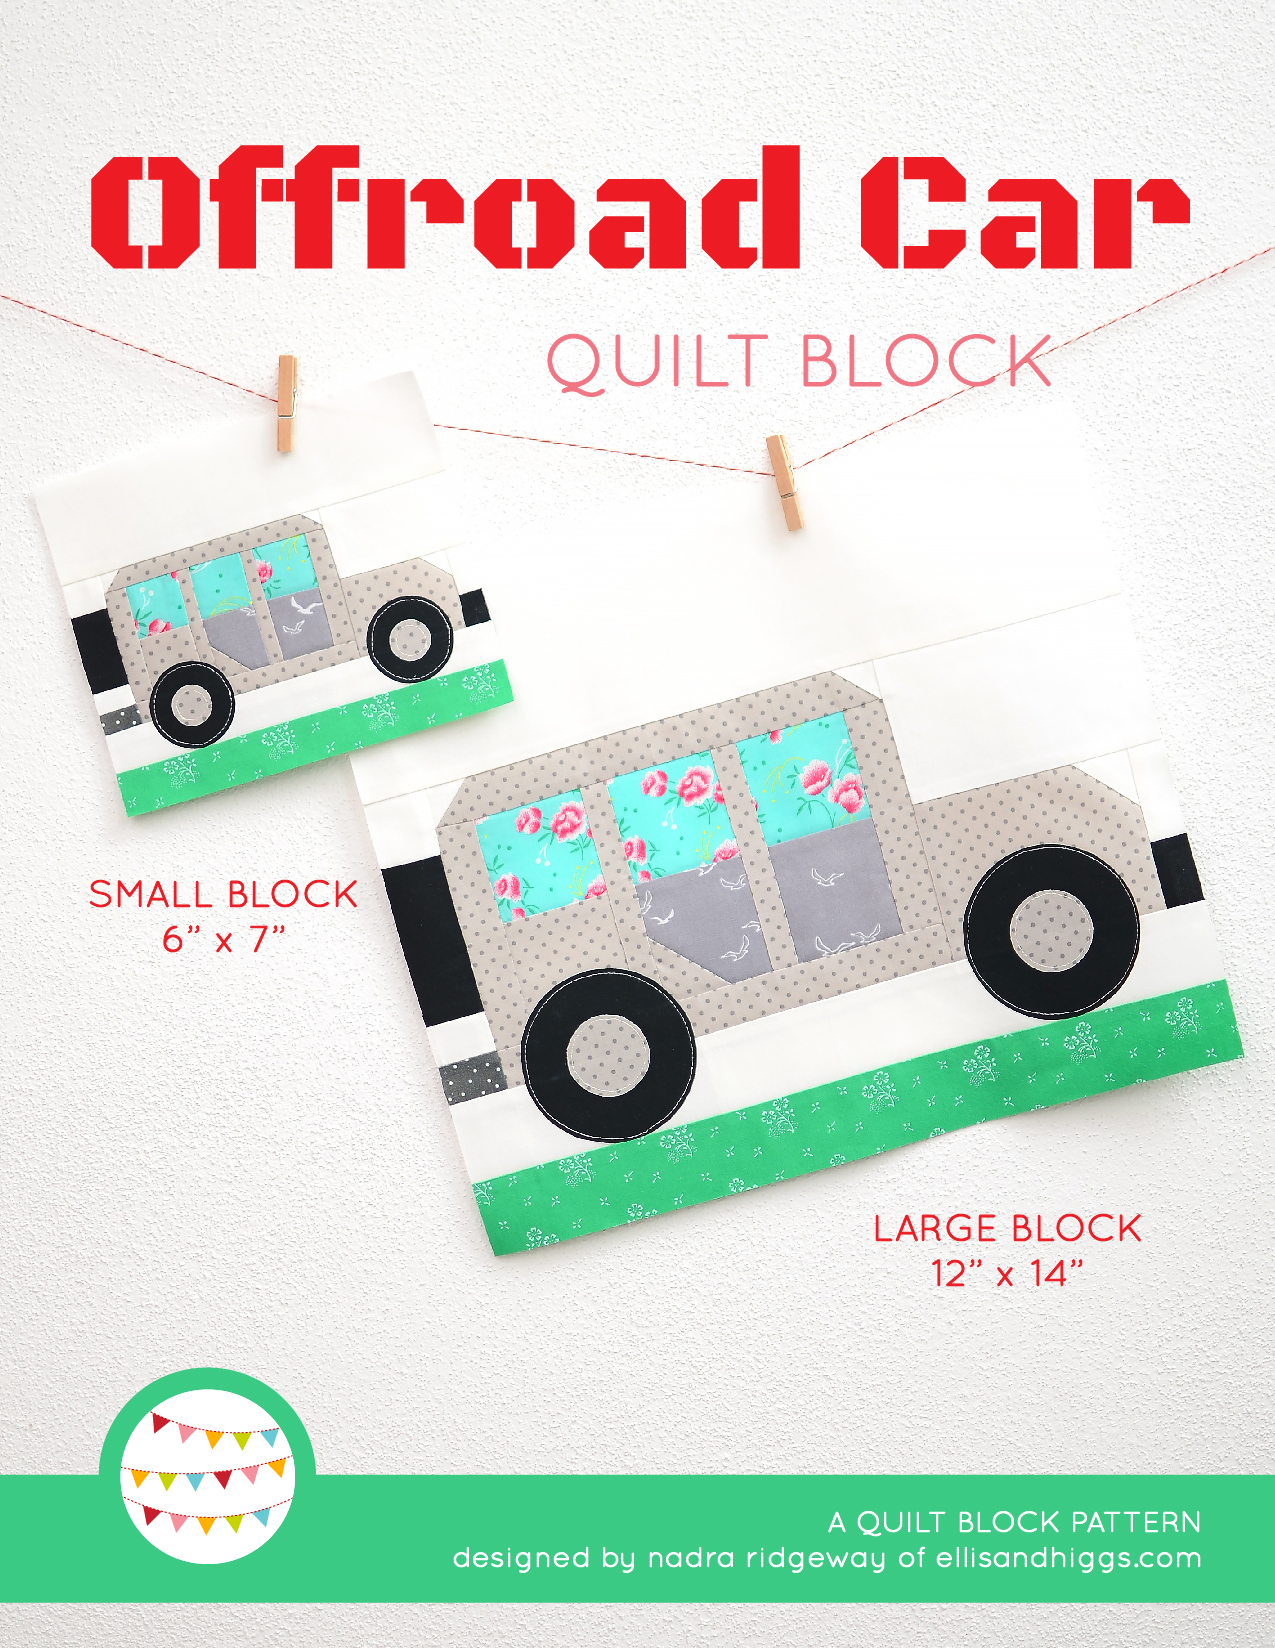 Summer quilt patterns - Offroad Car quilt pattern